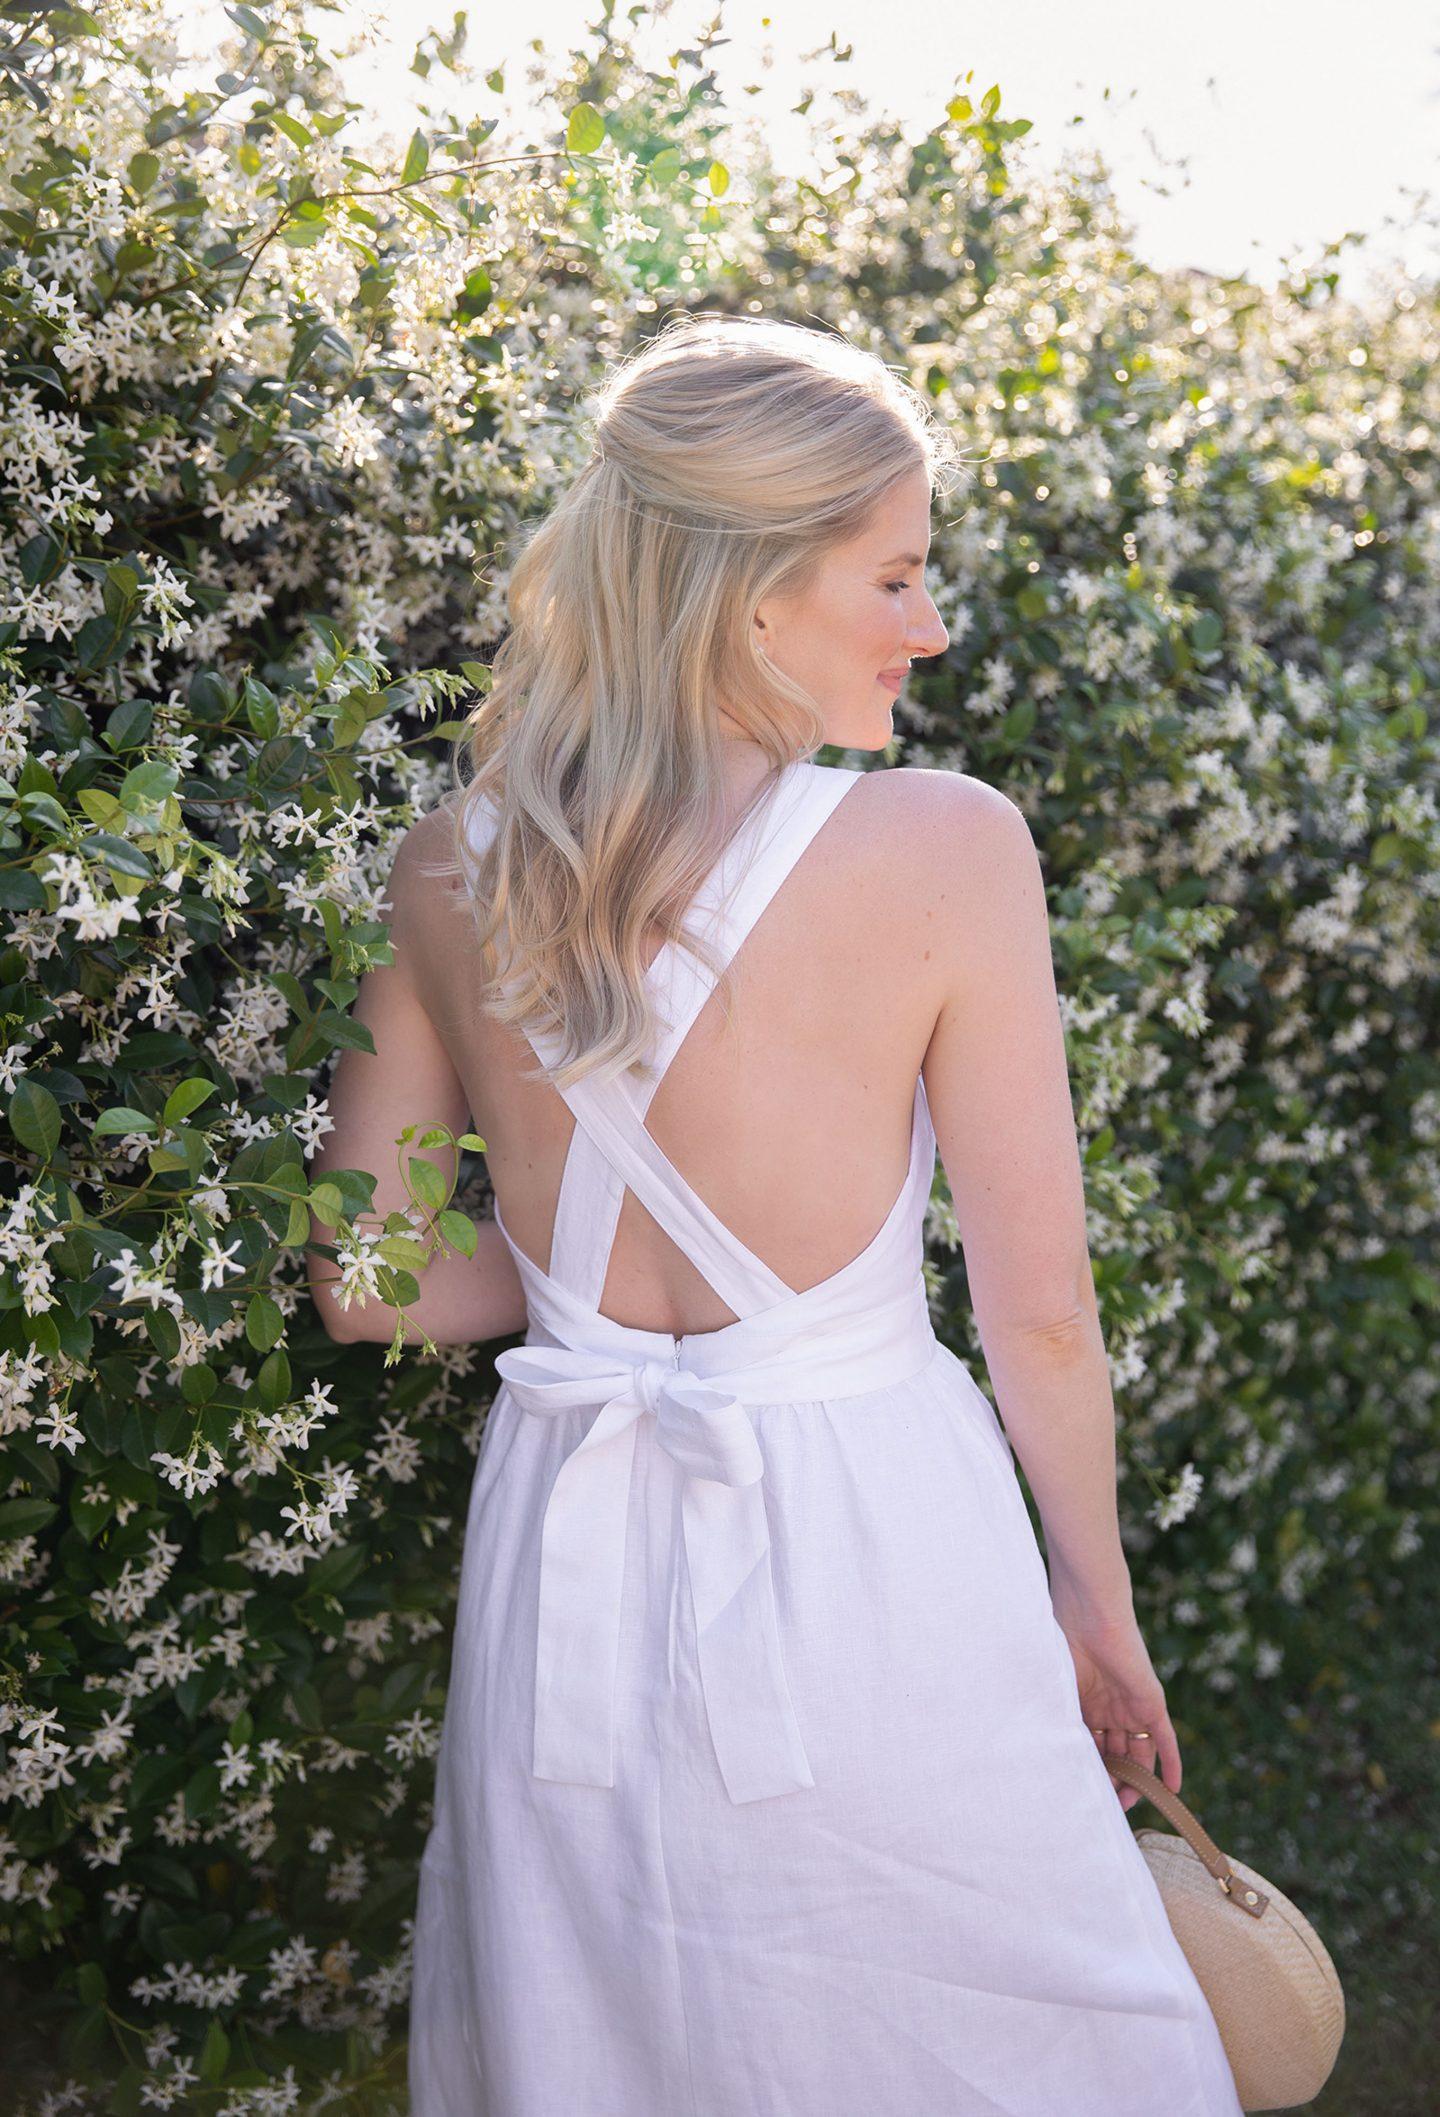 Ashley Brooke Wearing Backless Dress near a Jasmine Bloom